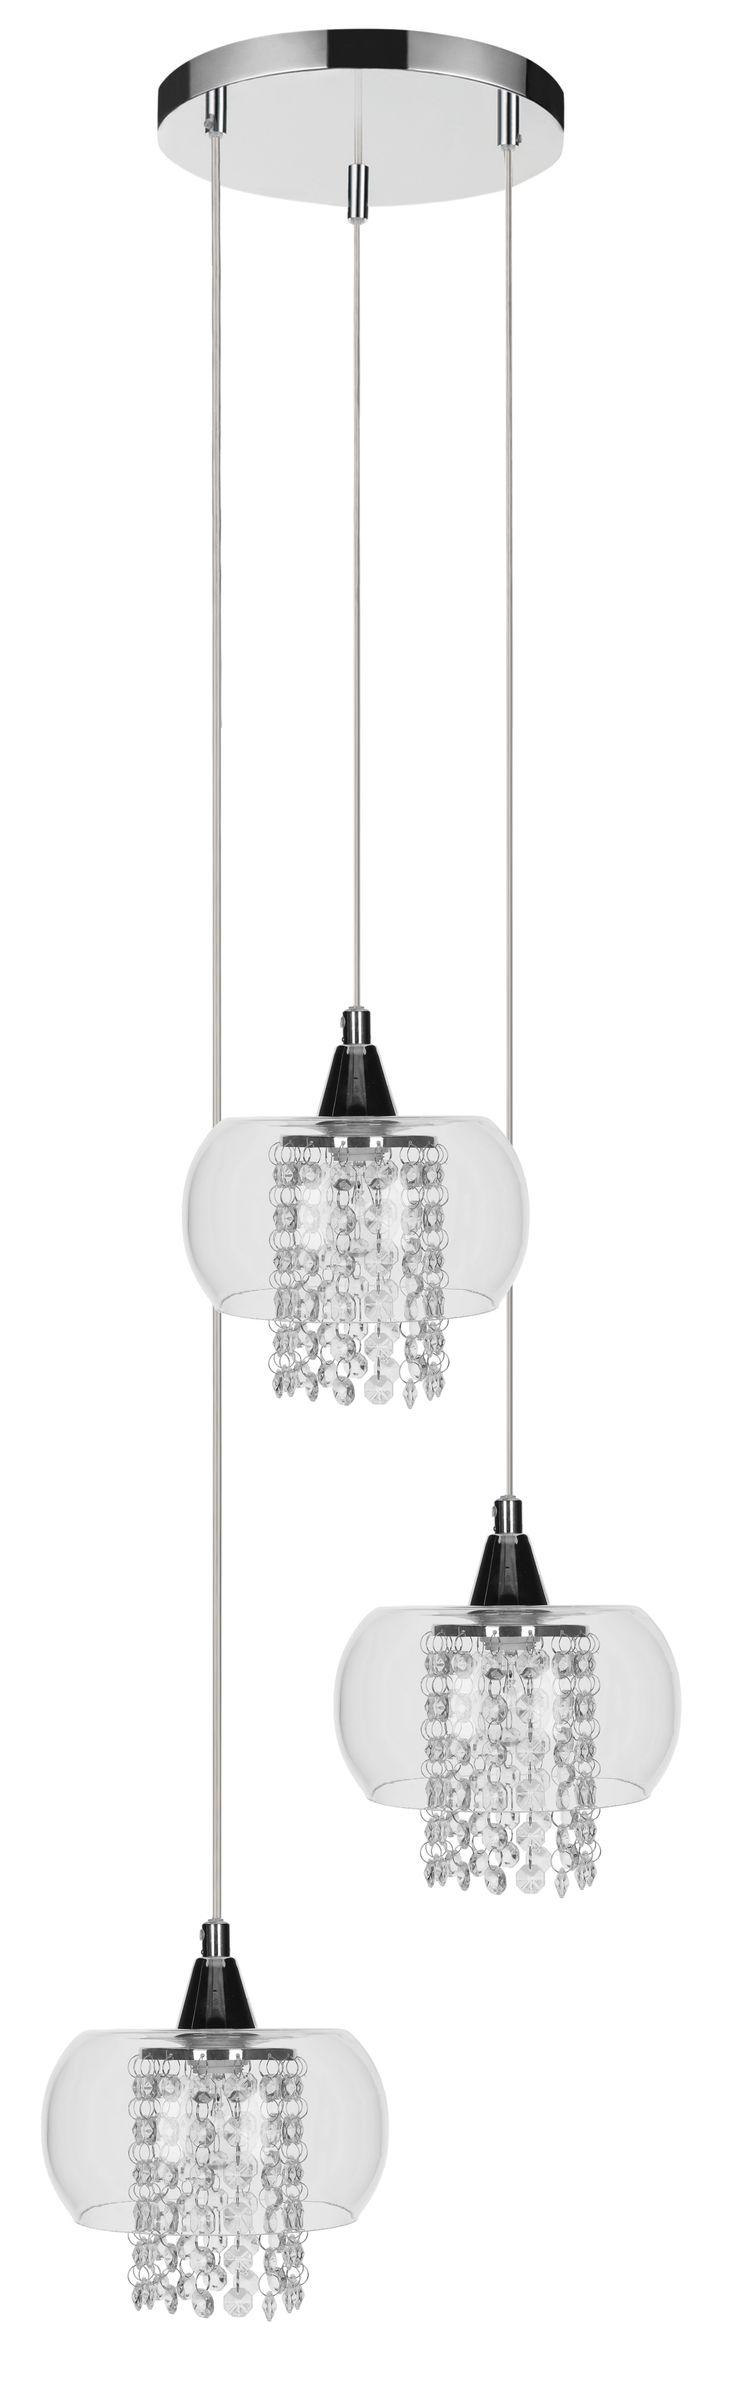 Cordia pendant lamp from SPOT Light